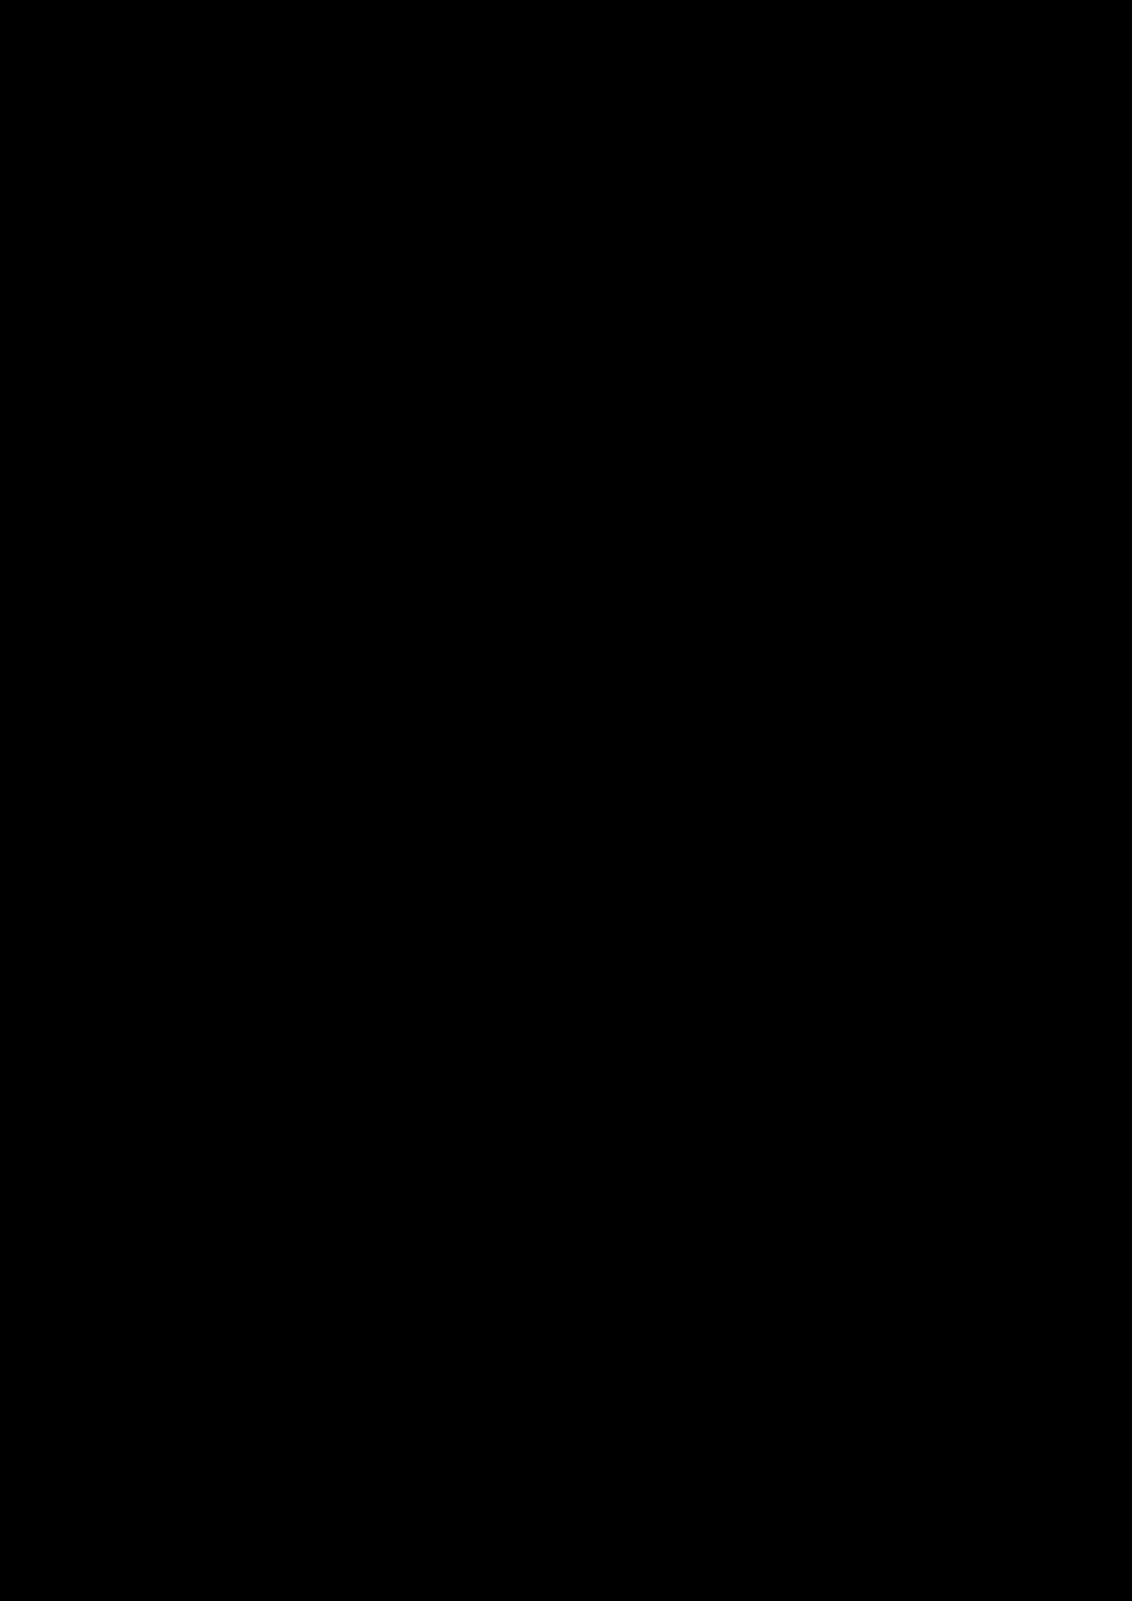 Ispoved Pervogo Boga slide, Image 17